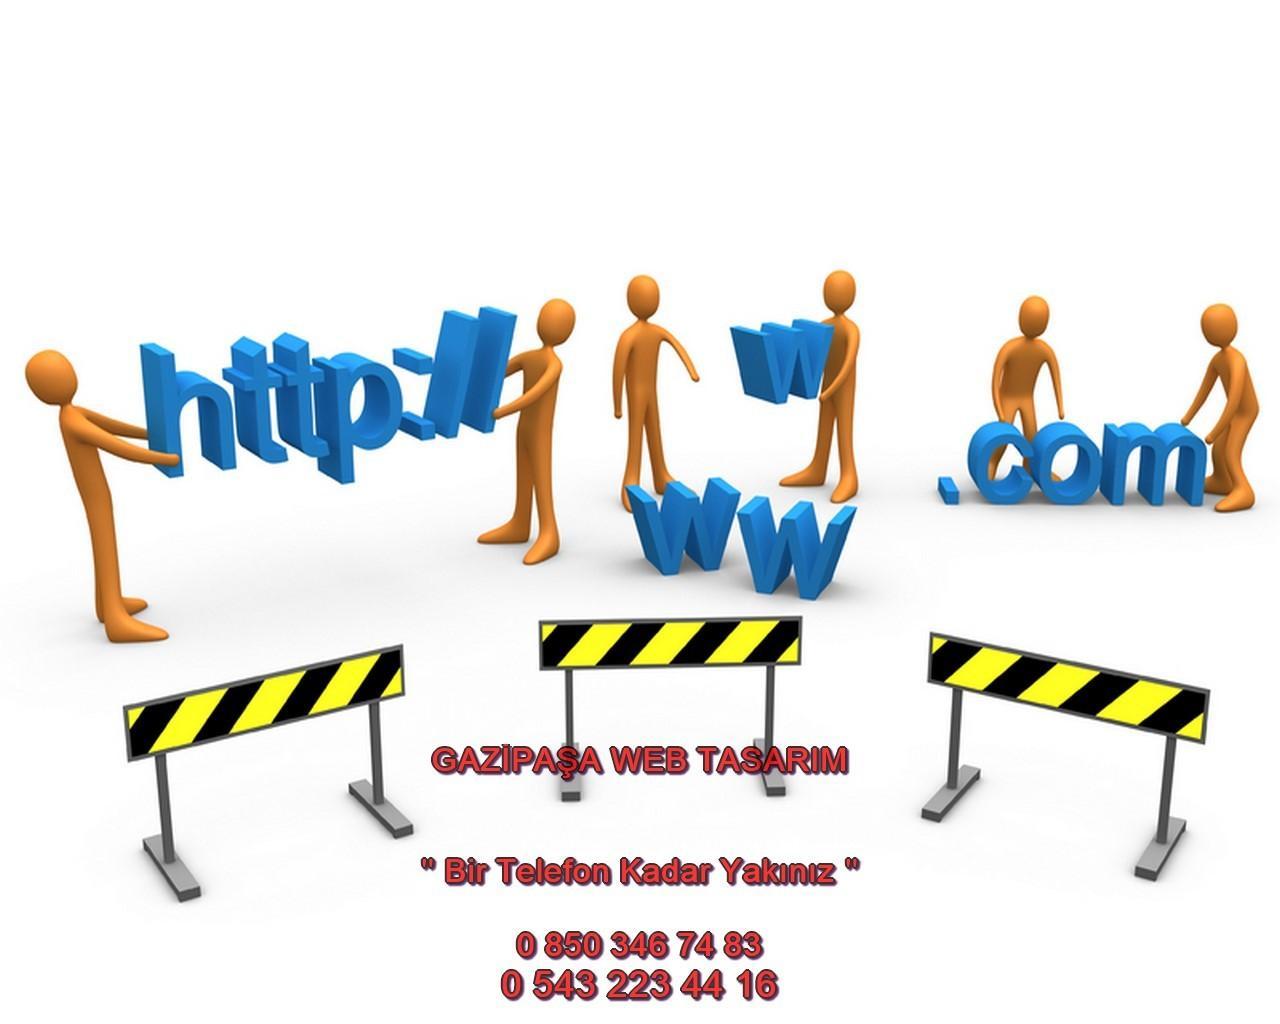 Gazipaşa Web Tasarım